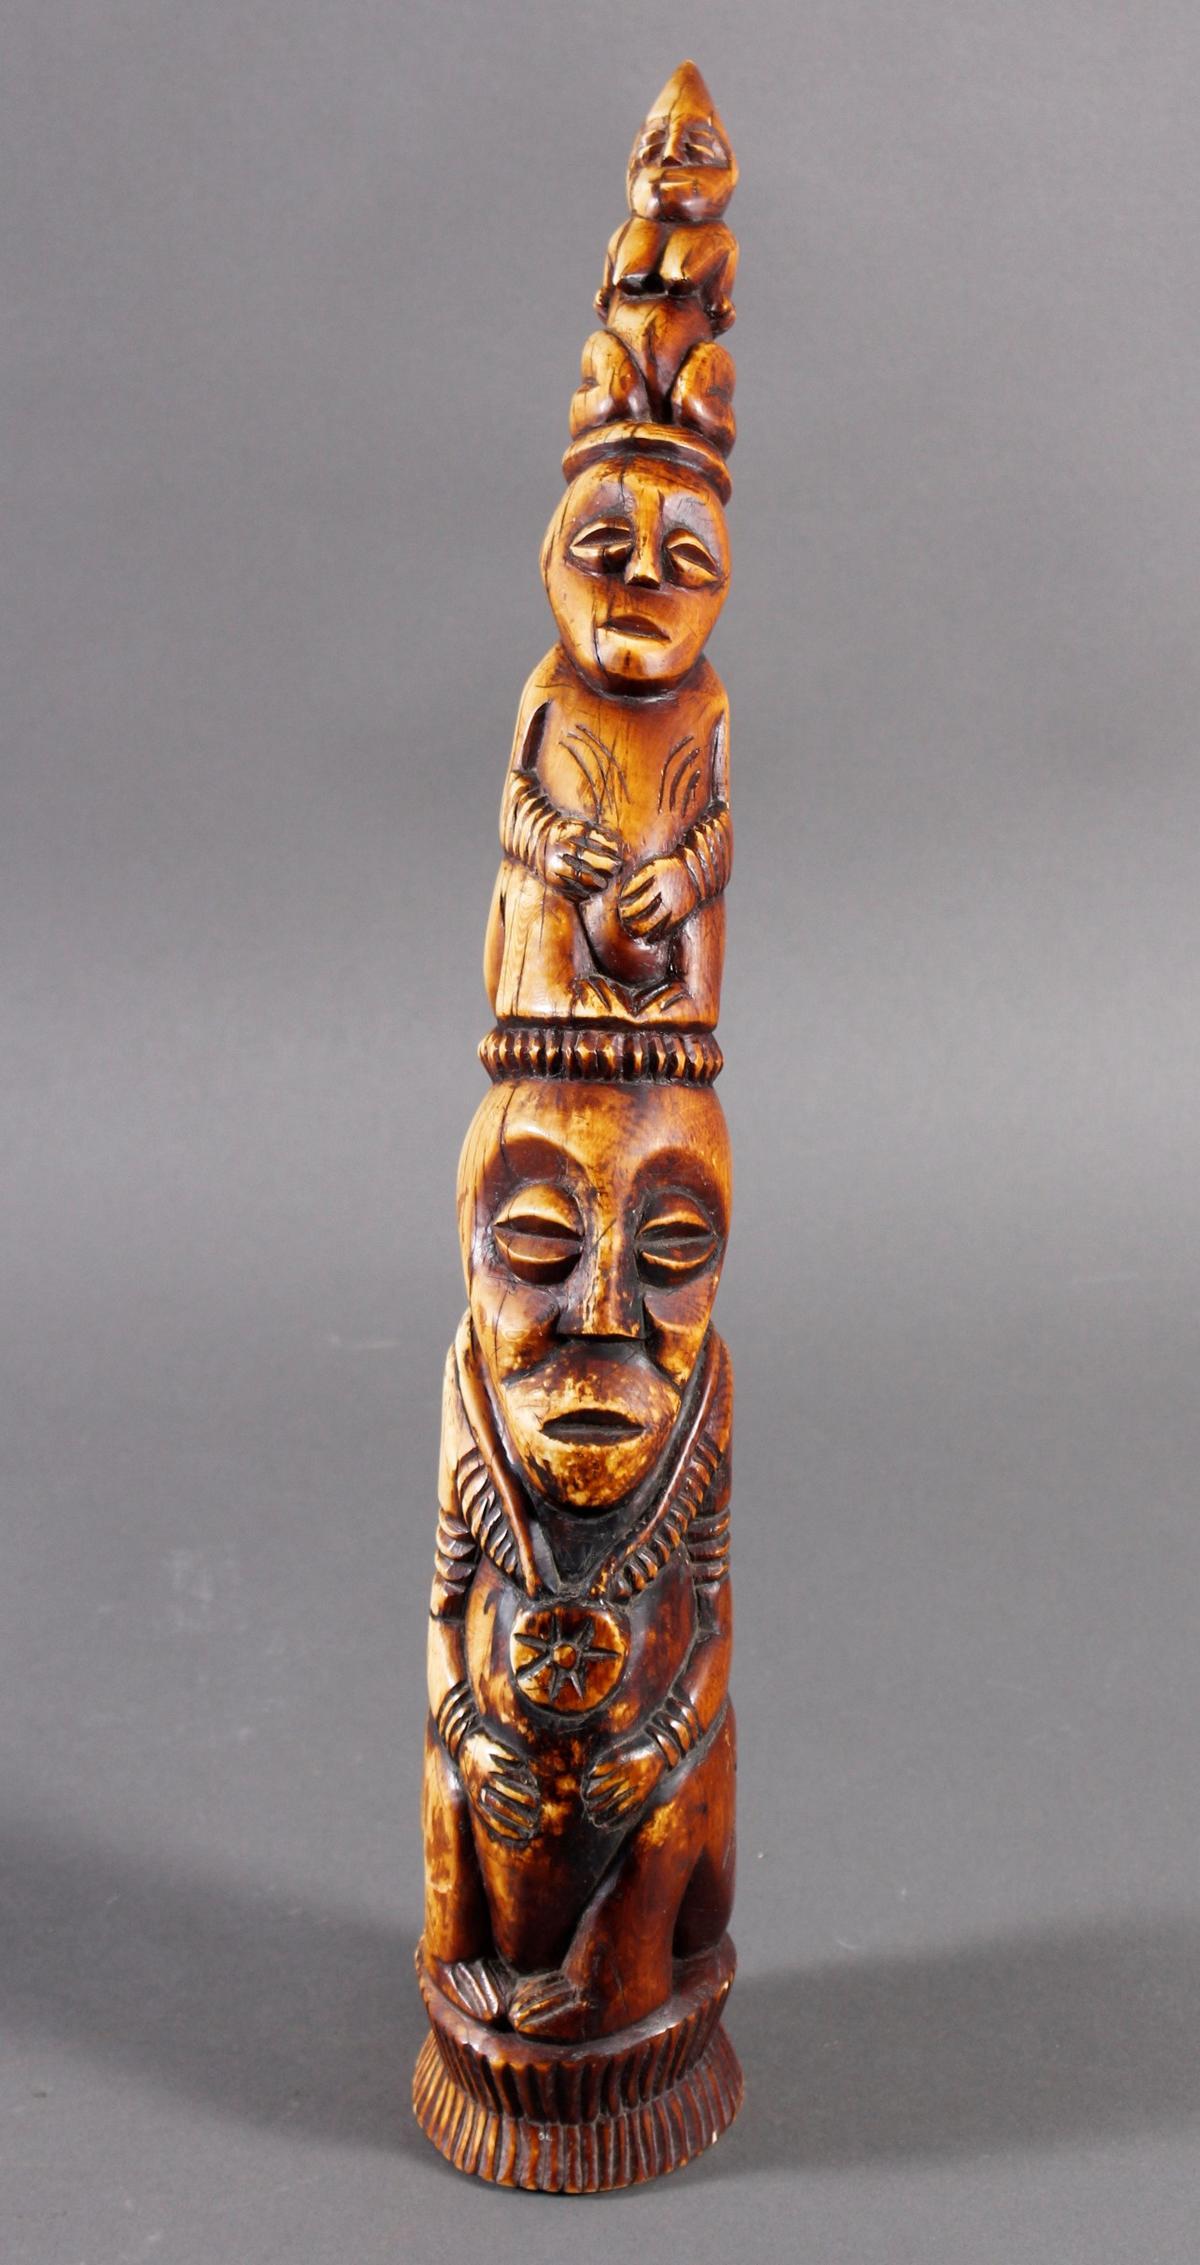 Elfenbein Stoßzahn, Lega / Kongo um 1920 / 1930-2